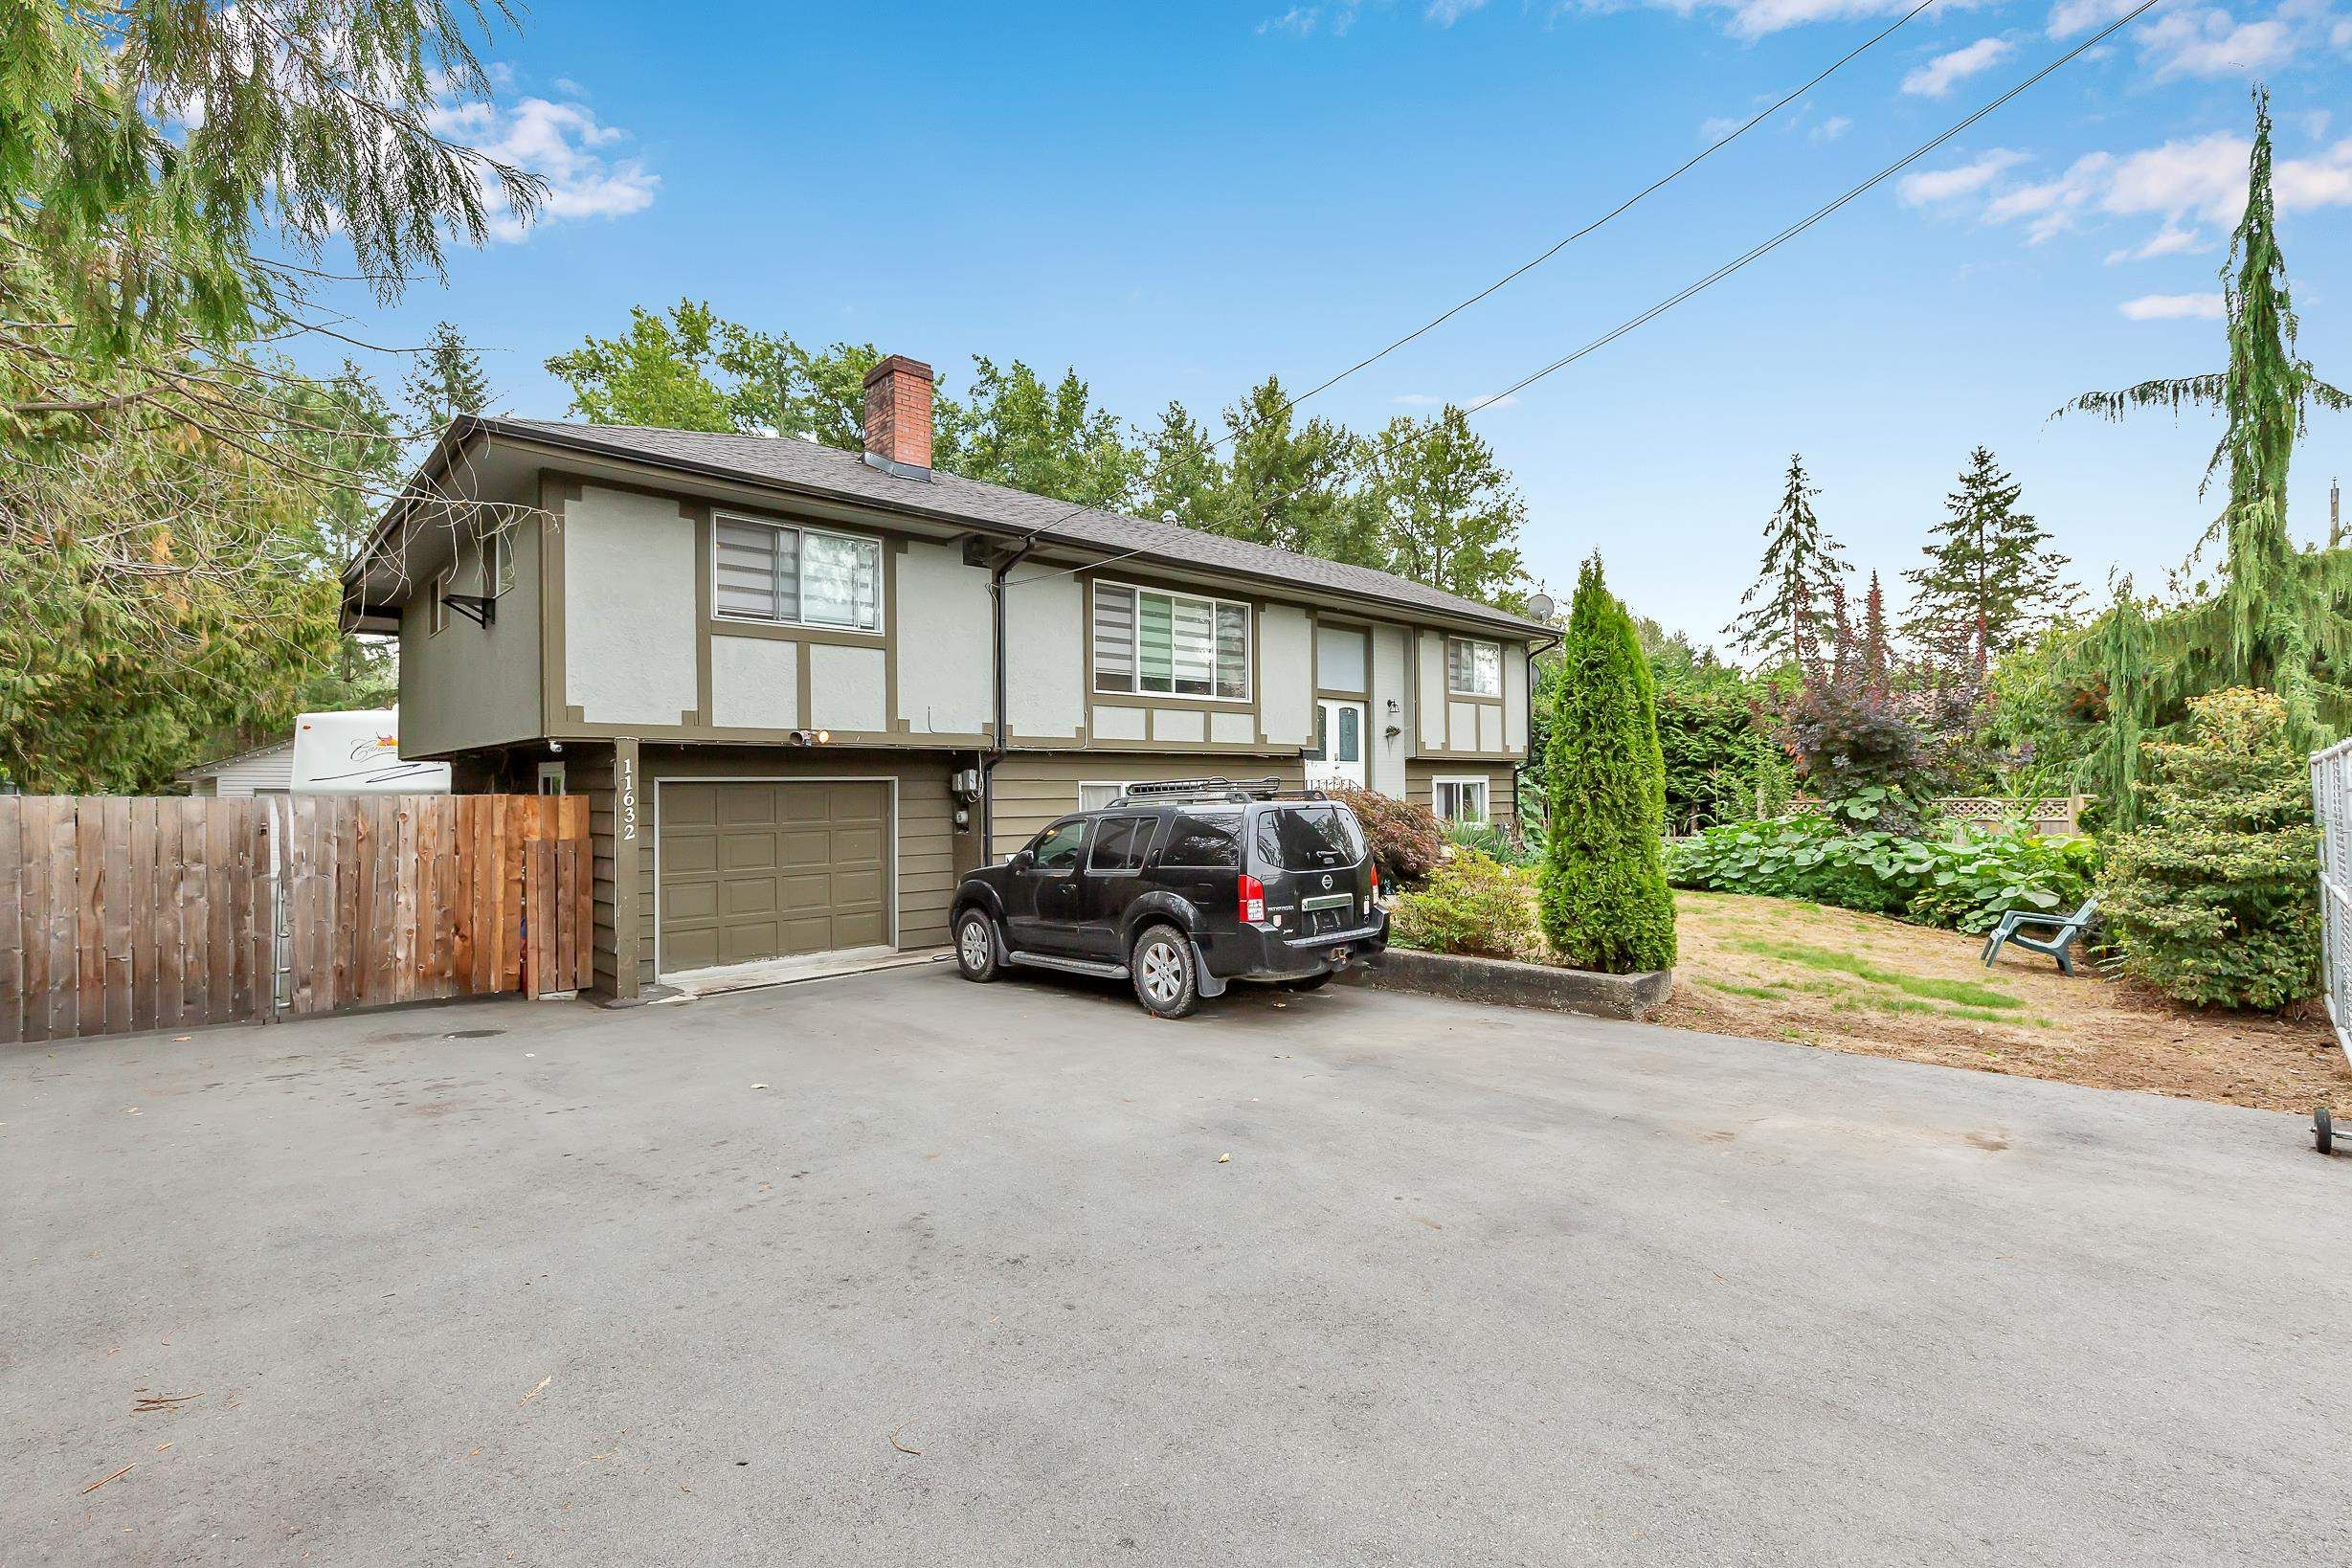 Main Photo: 11632 243 Street in Maple Ridge: Cottonwood MR House for sale : MLS®# R2614299